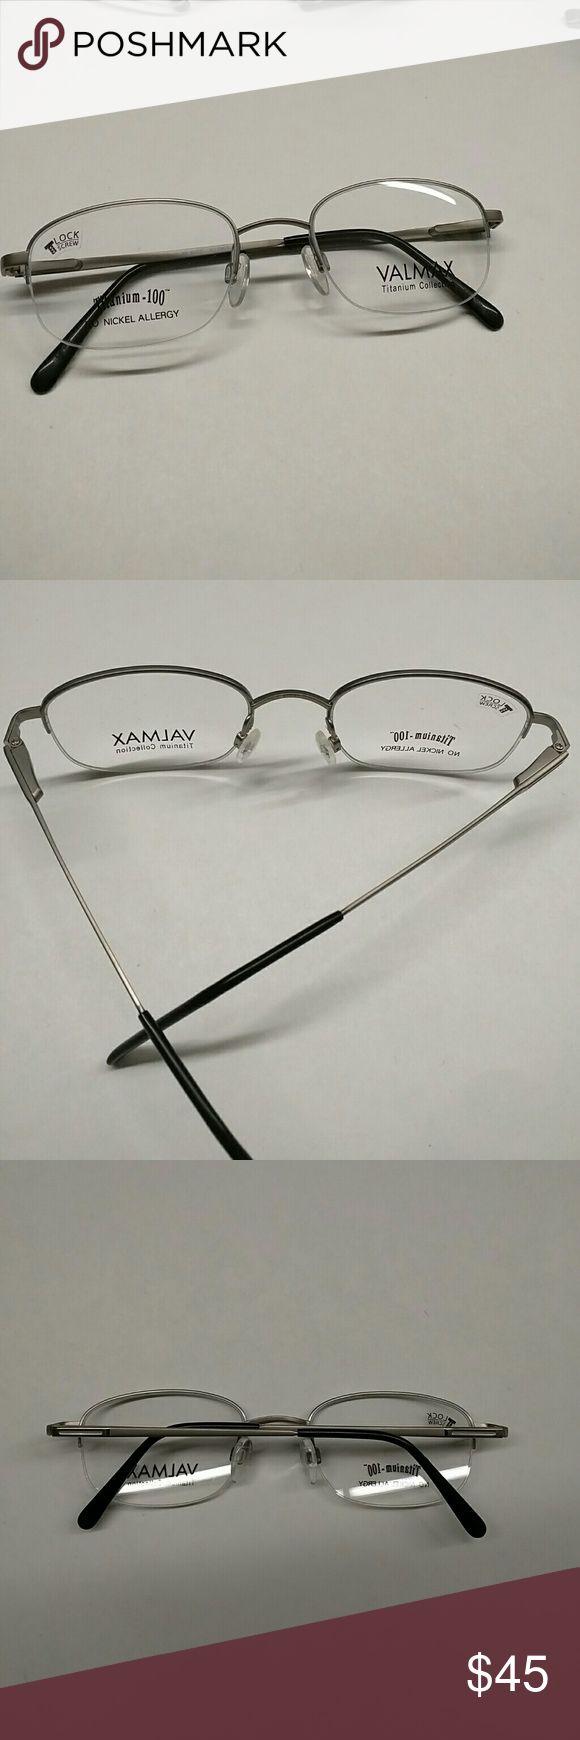 Valmax titanium no nickel allergy eyeglass frame New frame valmax Accessories Glasses